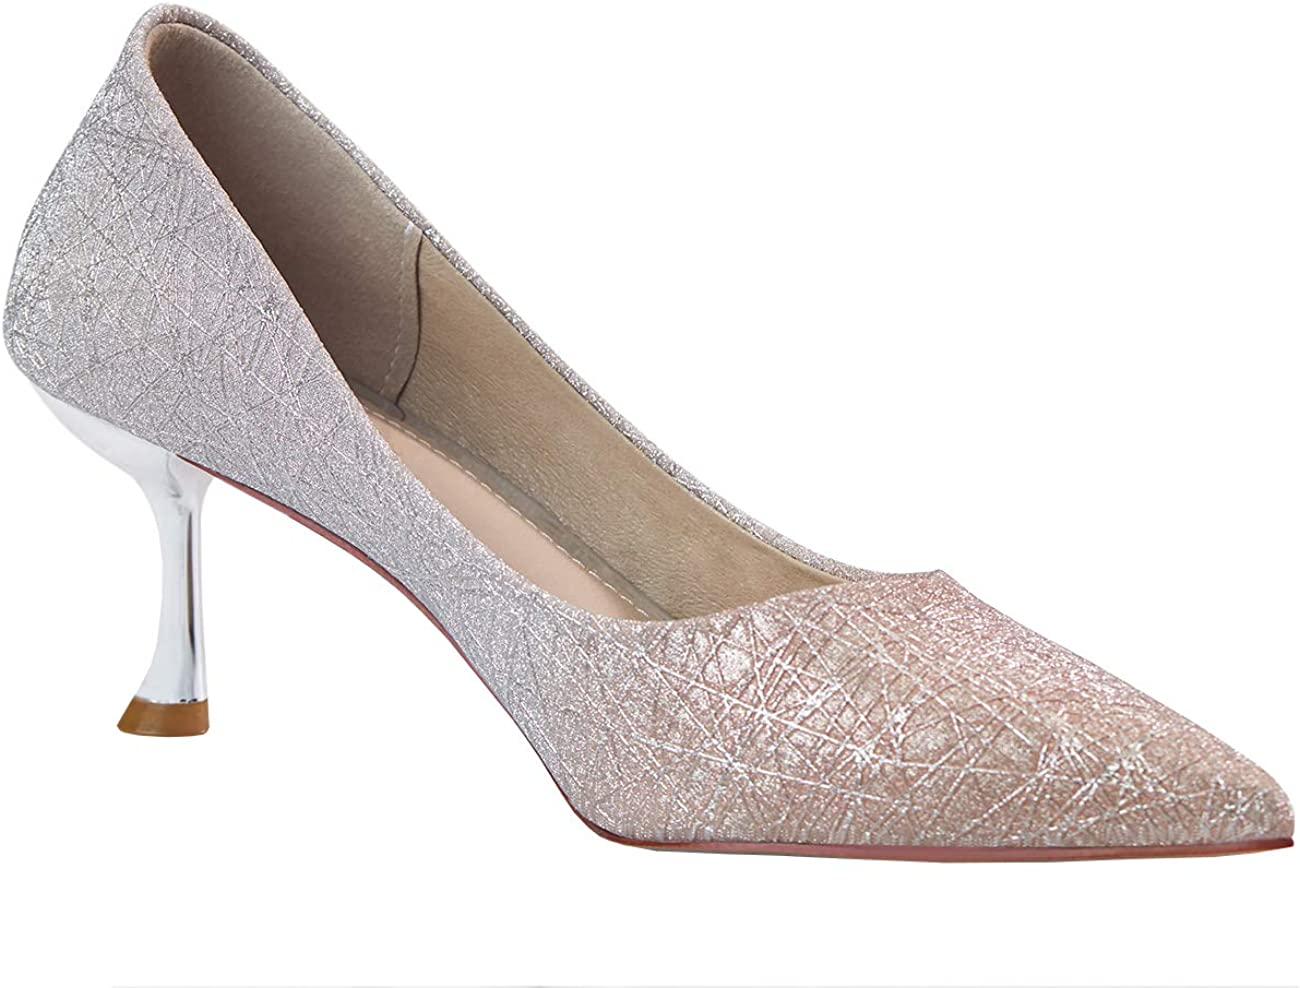 C.PARAVANO Womens High Heel Shoes Glitter Pumps Stiletto Heels 6CM Pointed Toe Court Shoes